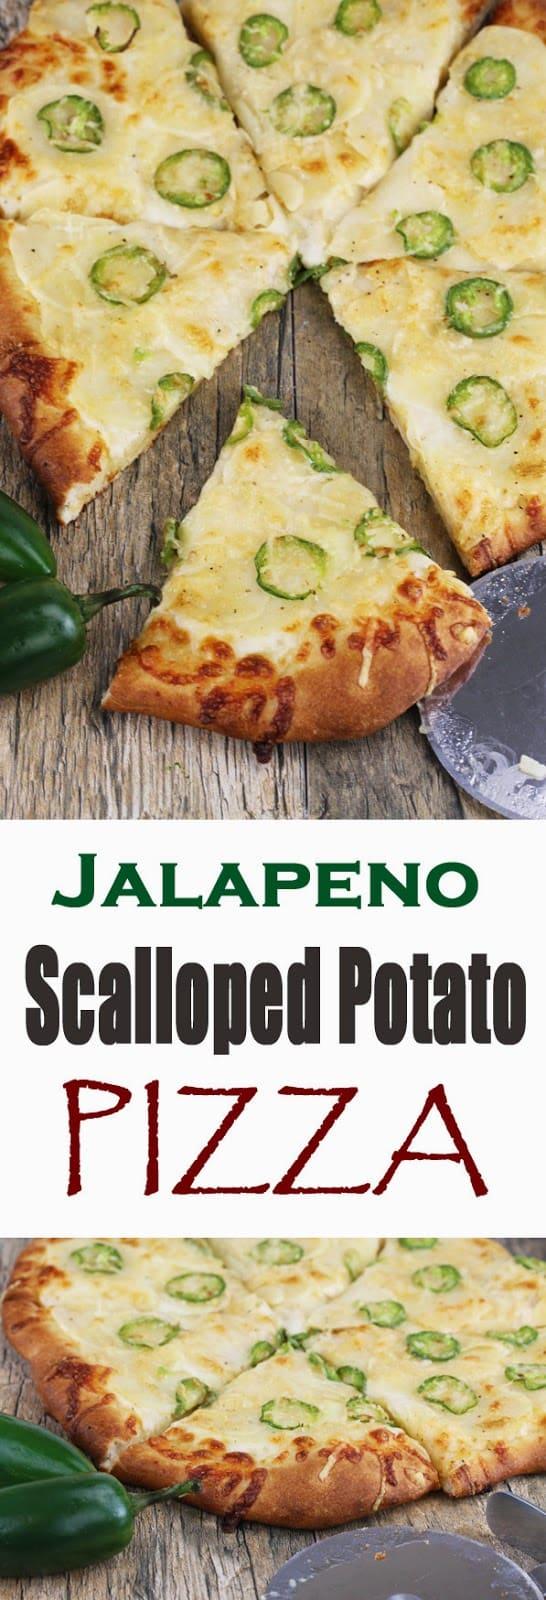 Jalapeno Scalloped Potato Pizza